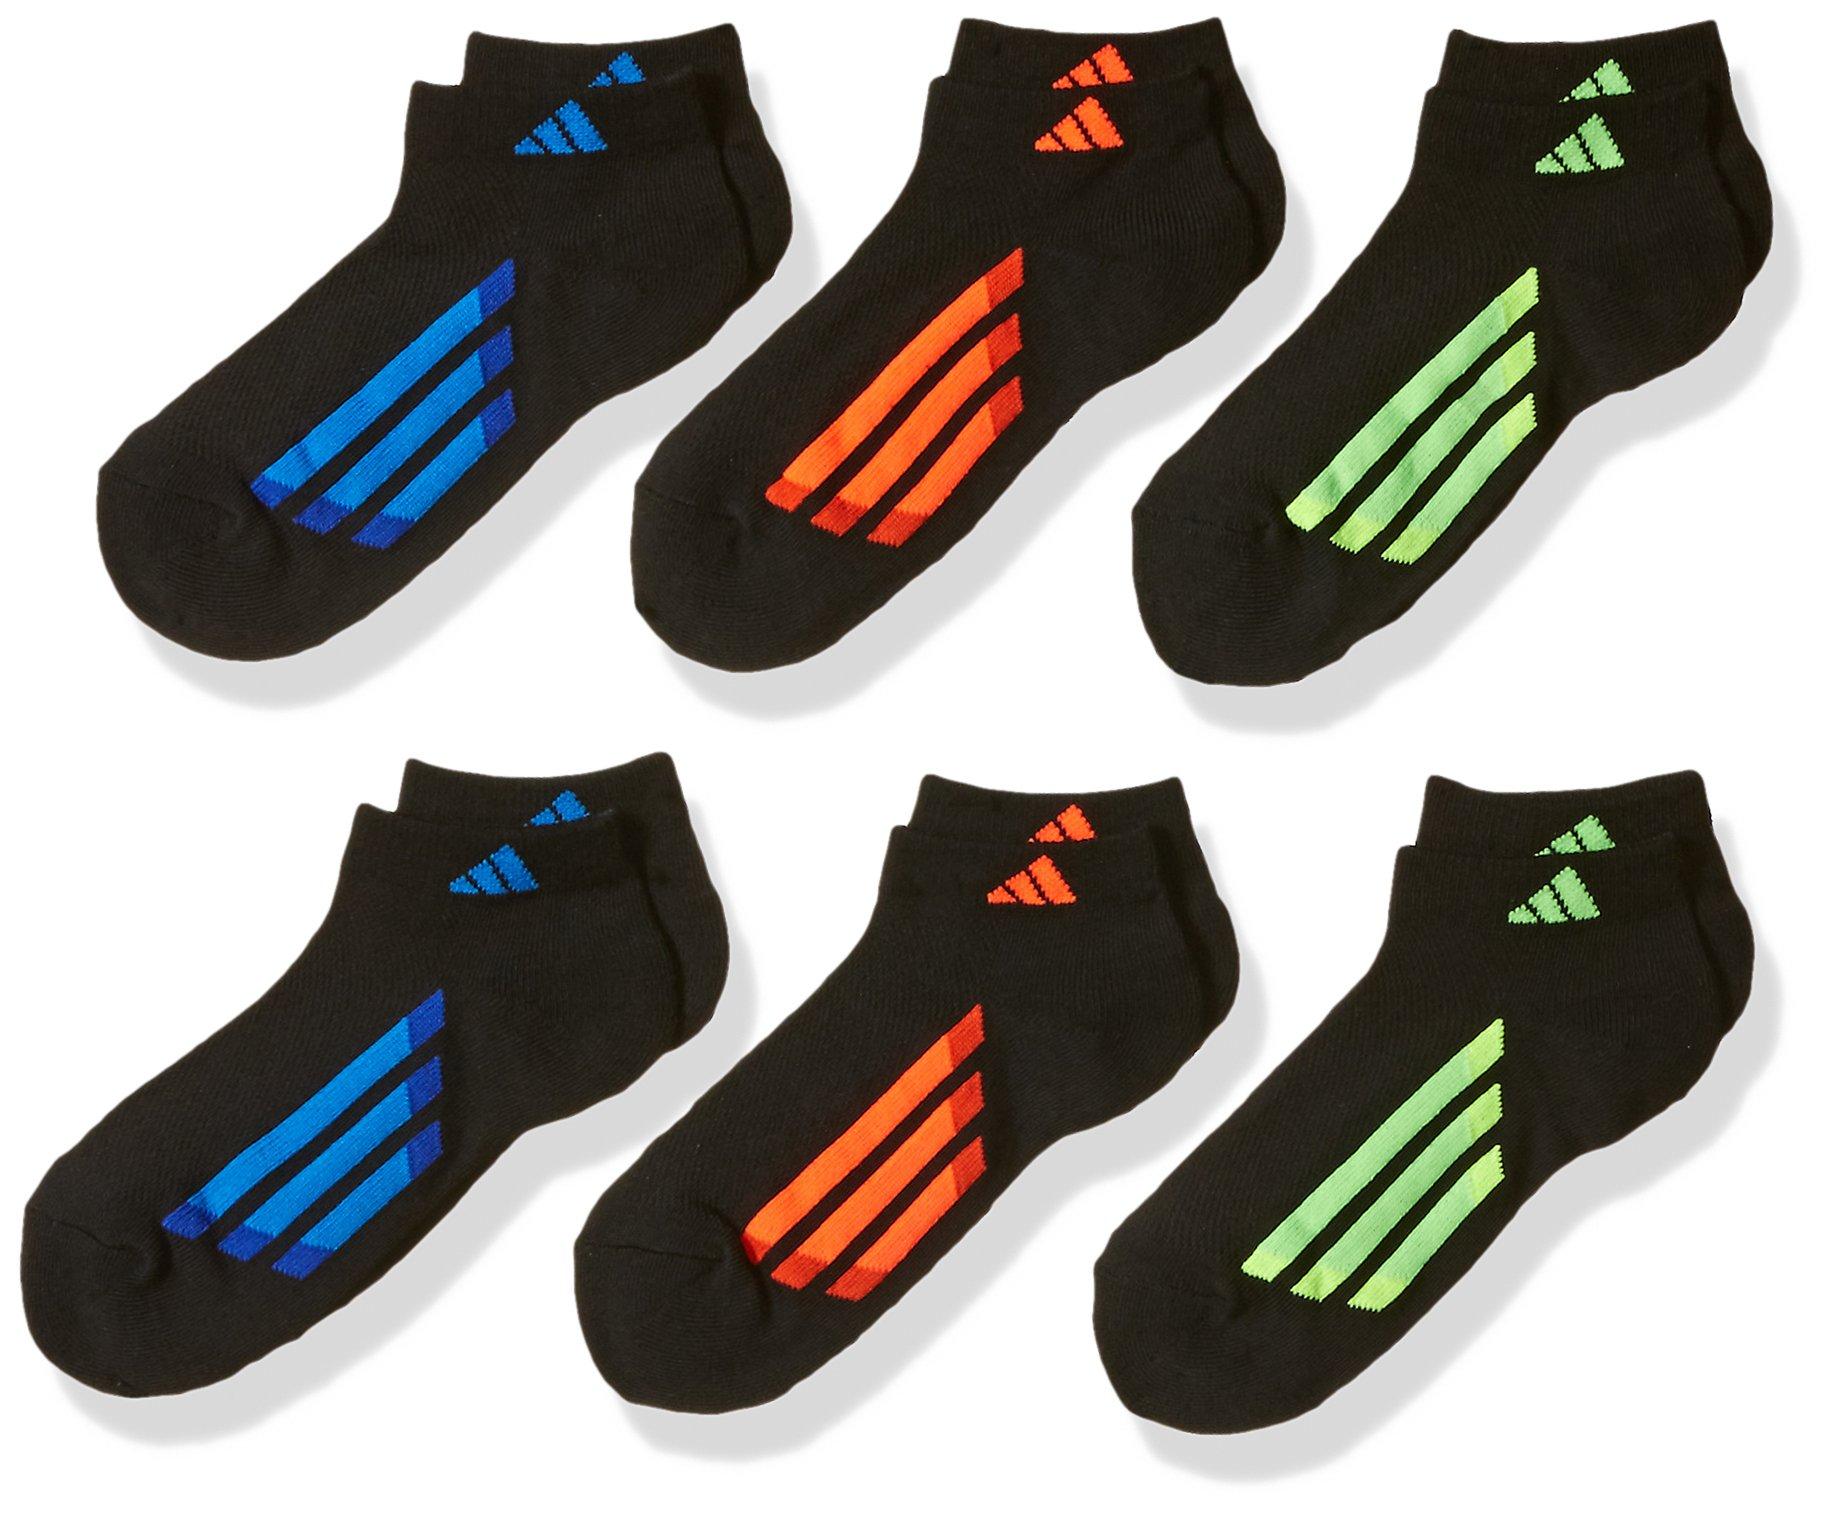 adidas Youth Kids-Boy's/Girl's Cushioned Low Cut Socks (6-Pair), Black/Solar Red/Bold Orange/Solar Green/Solar Yell, Large, (Shoe Size 3Y-9) by adidas